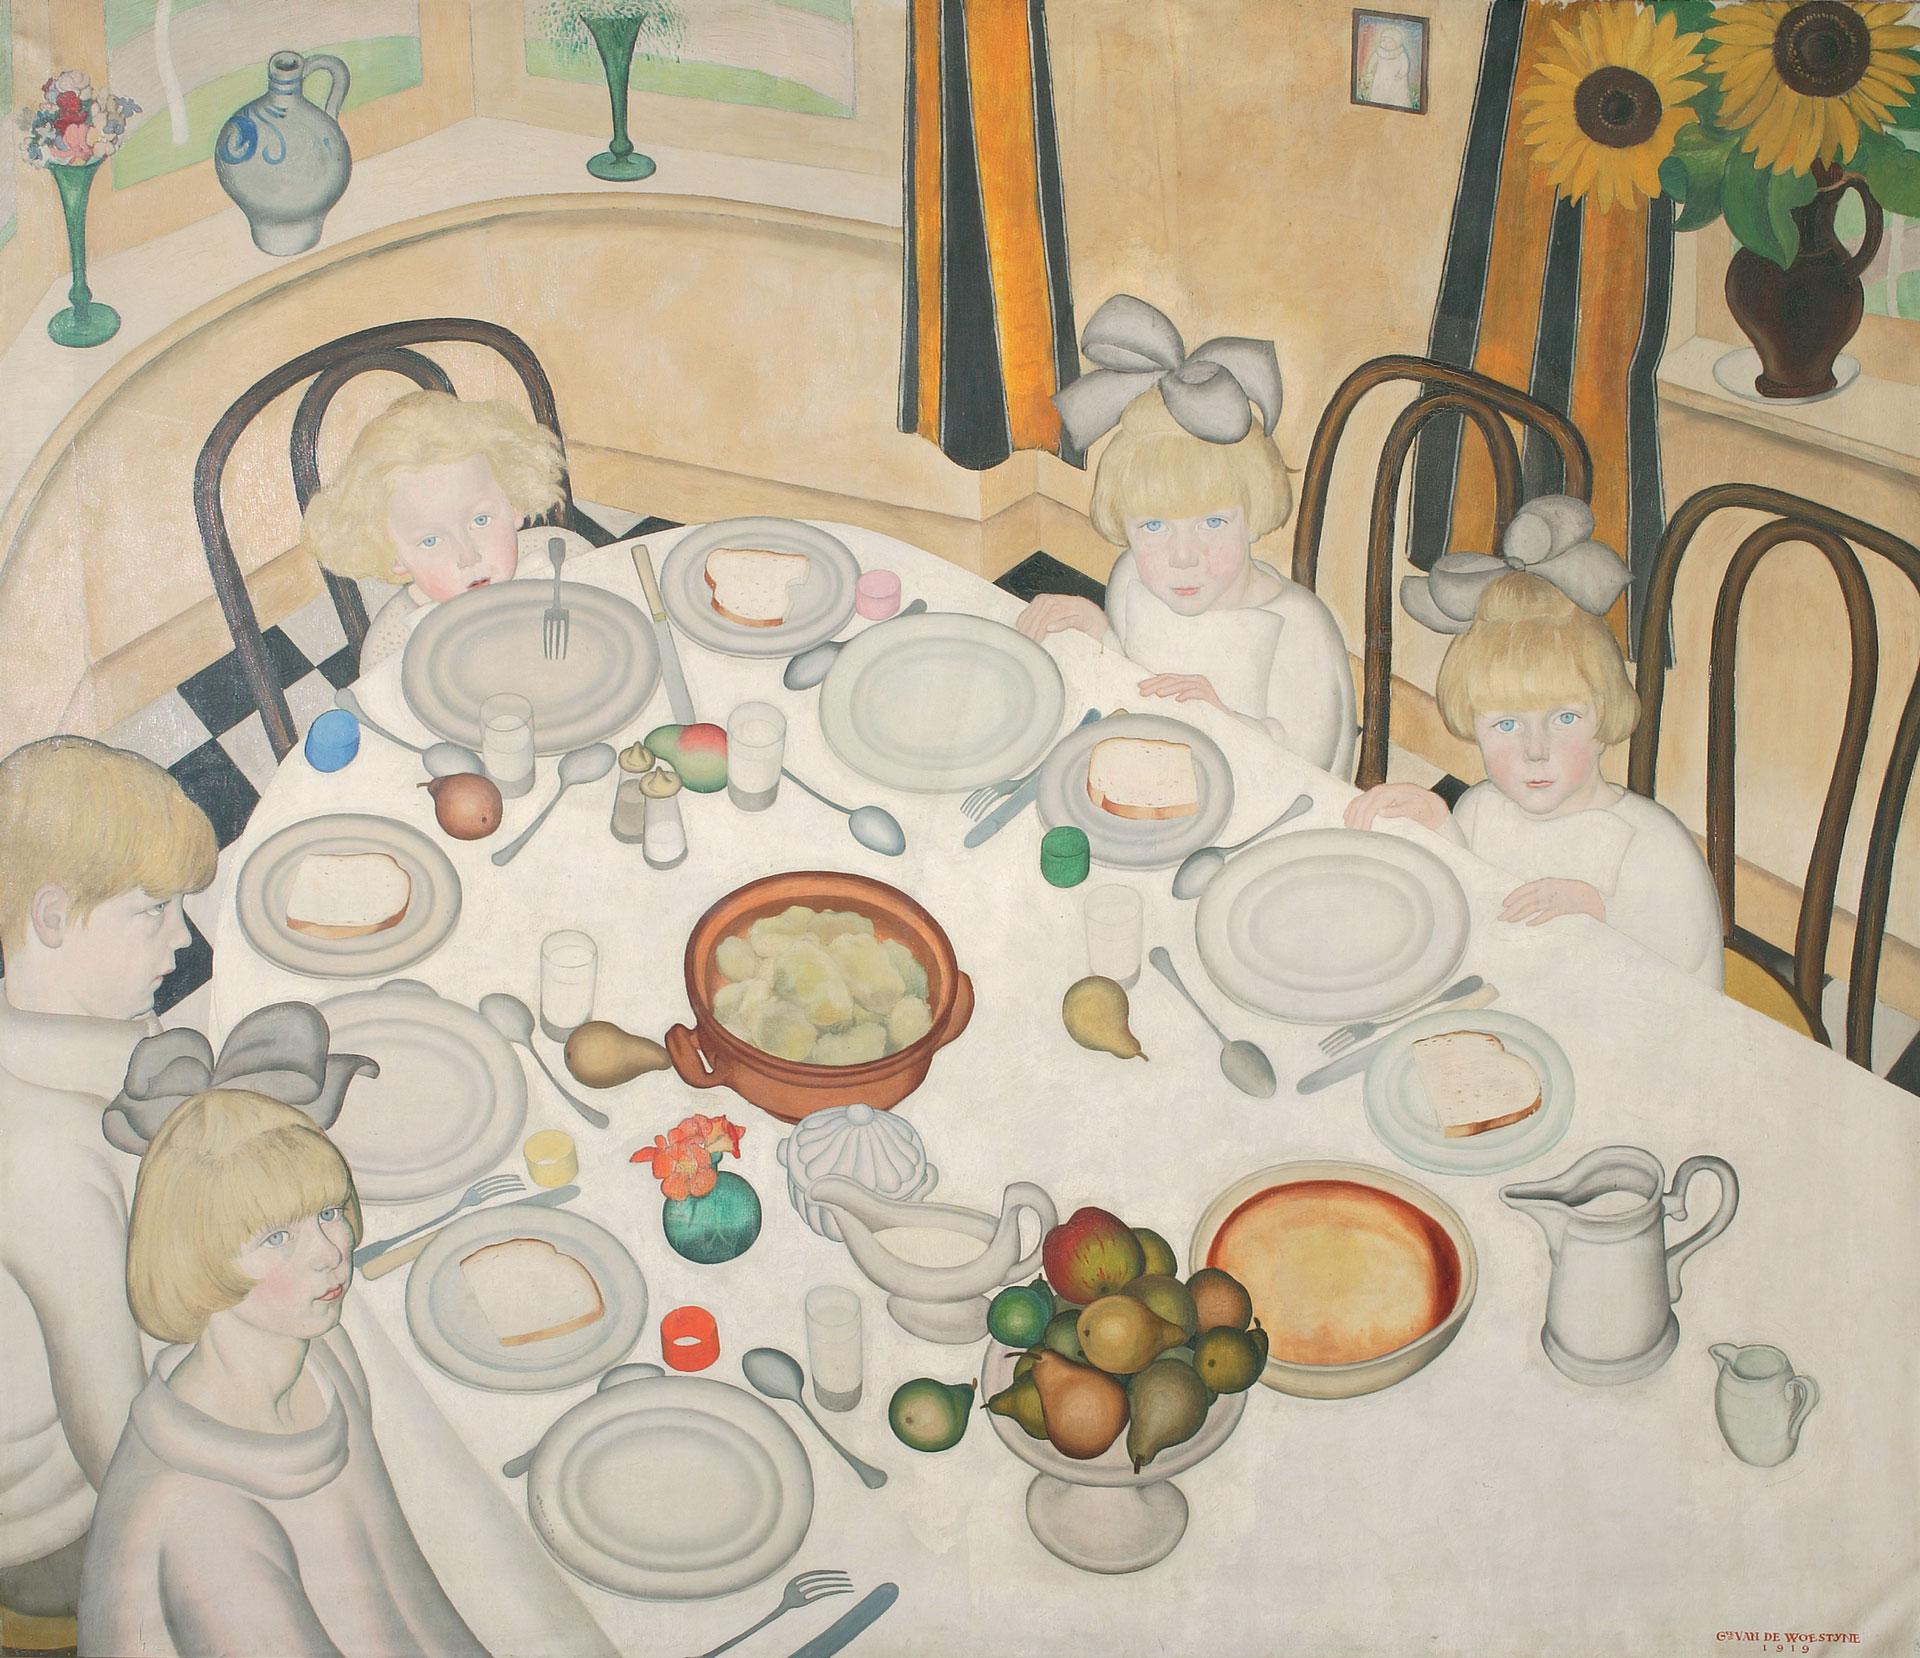 LA TABLE DES ENFANTS, 1919 - Gustave Van De Woestyne (1881-1947)